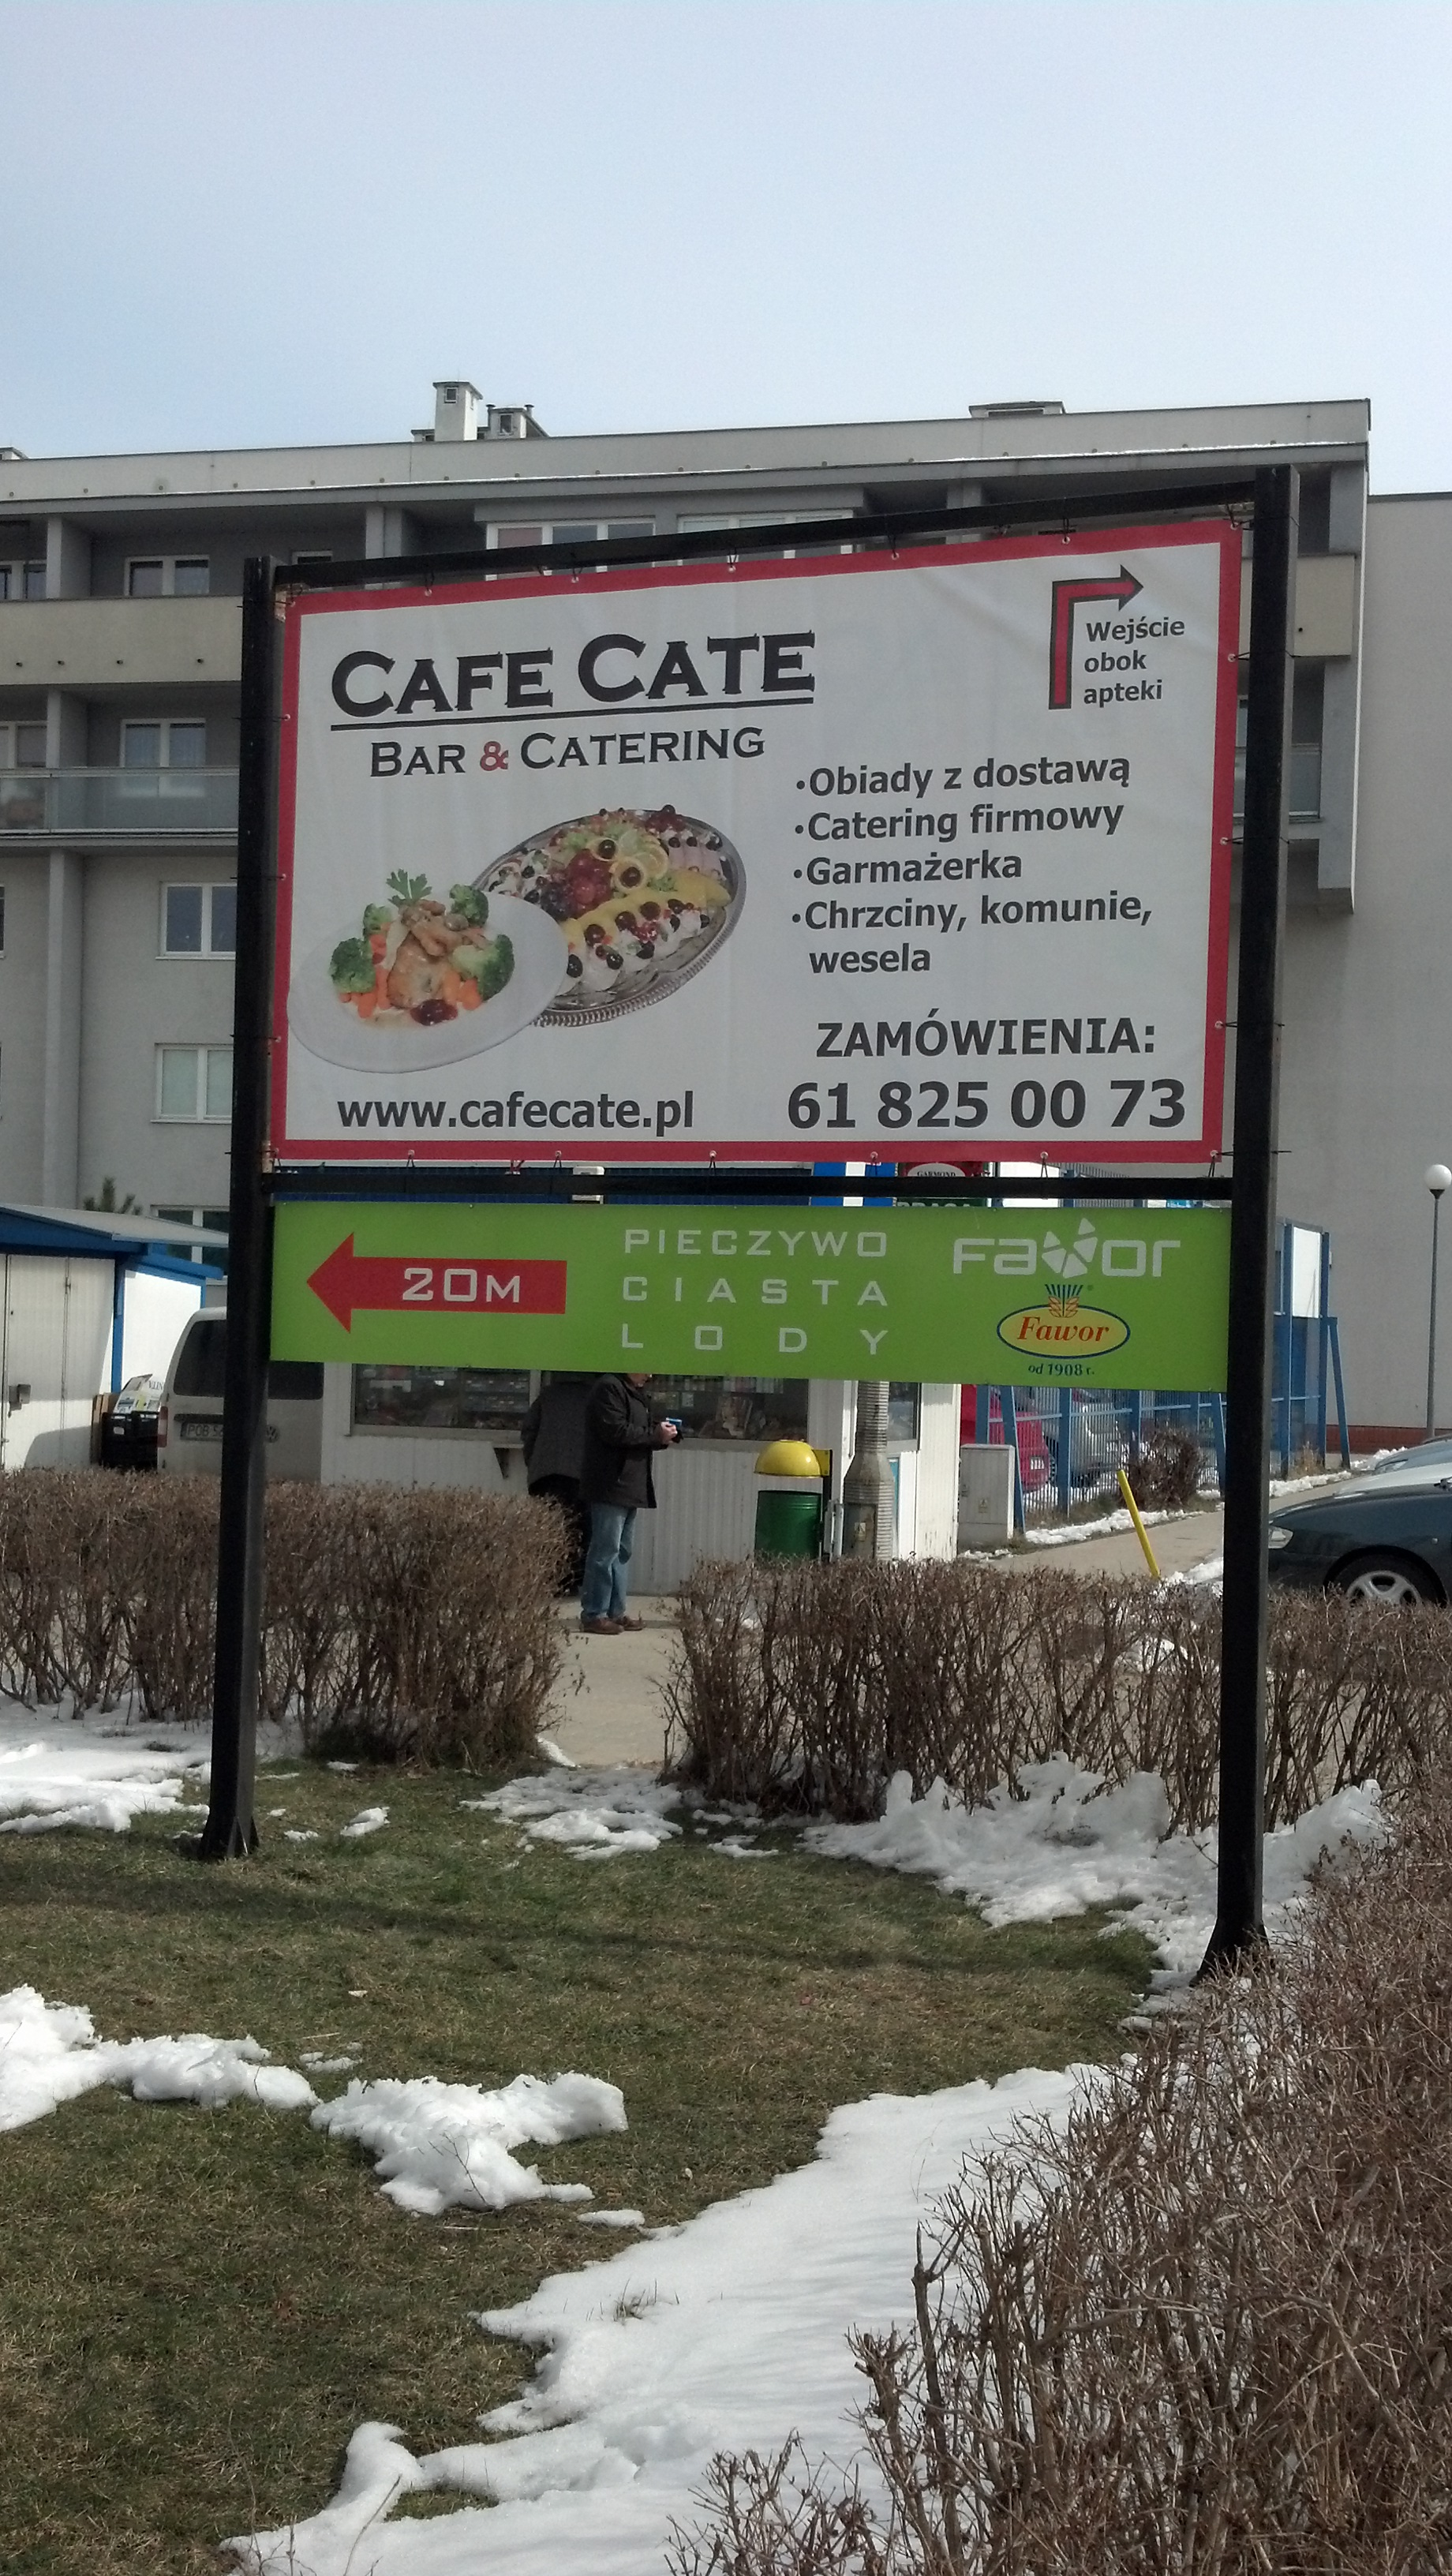 Baner reklamowy dla restauracji